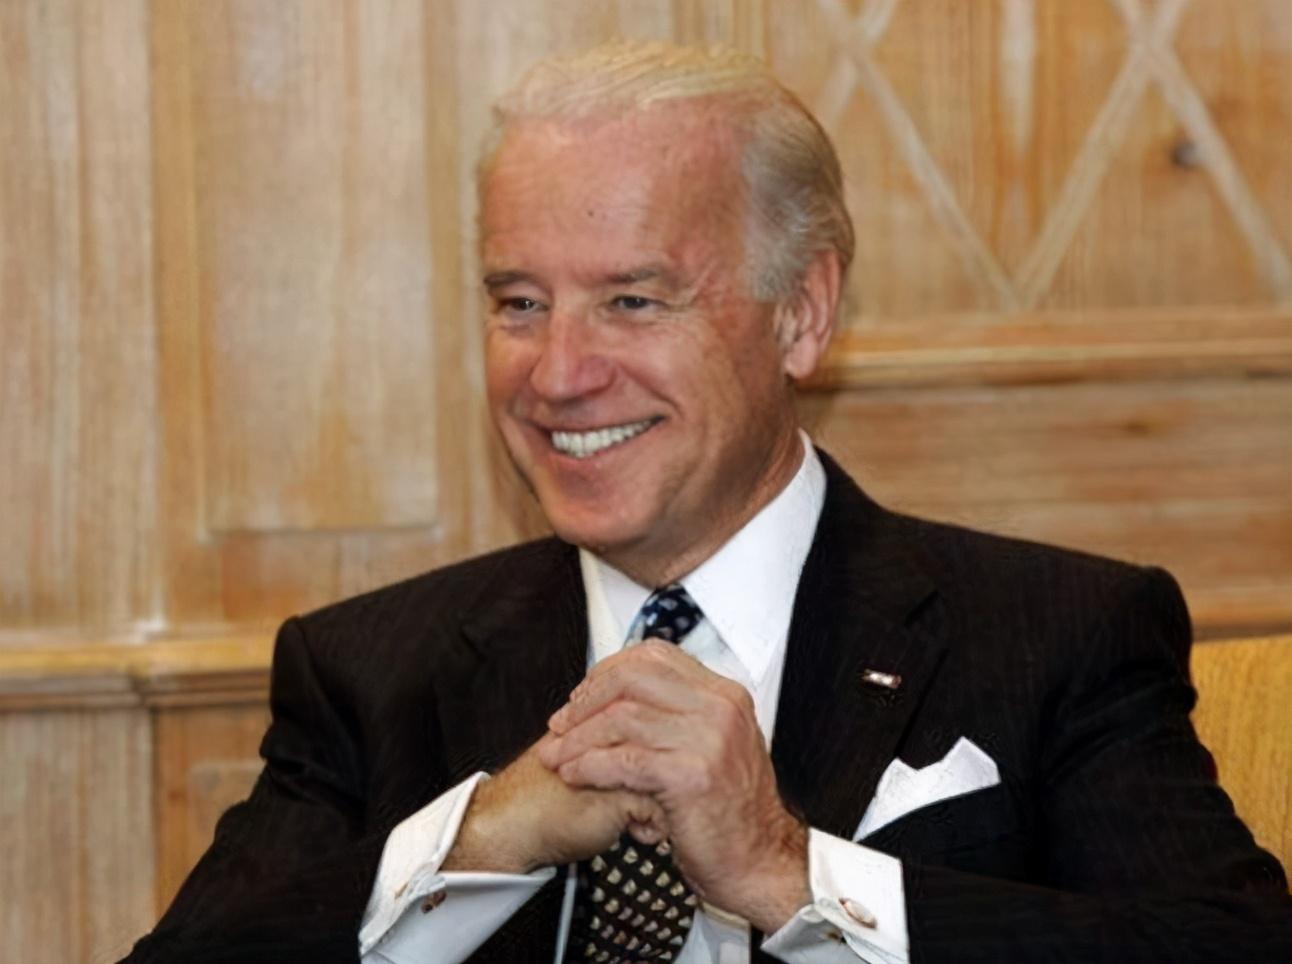 9e6693f51cba4373a5f2d55a2649cb53?from=pc - 田柯:了解美国第46任总统拜登的过去史